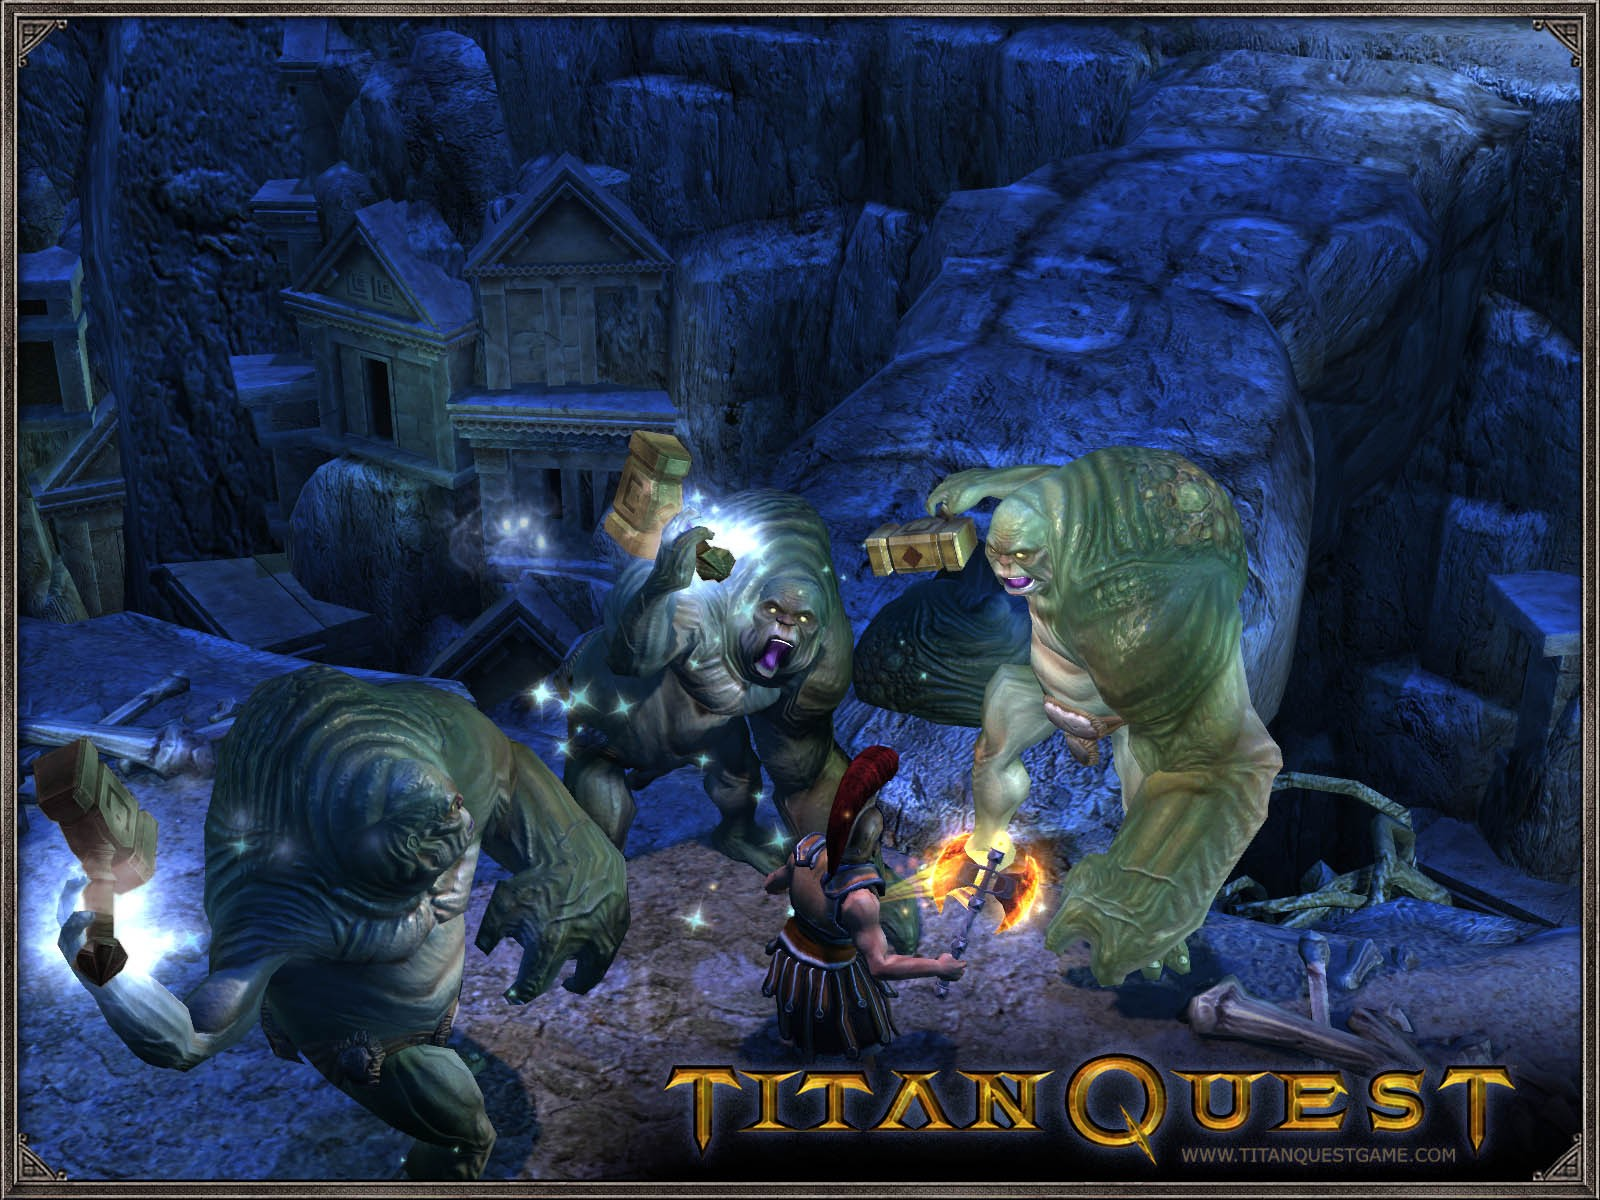 Titan Quest Gold Edition / Titan Quest + Titan Quest Immortal Throne